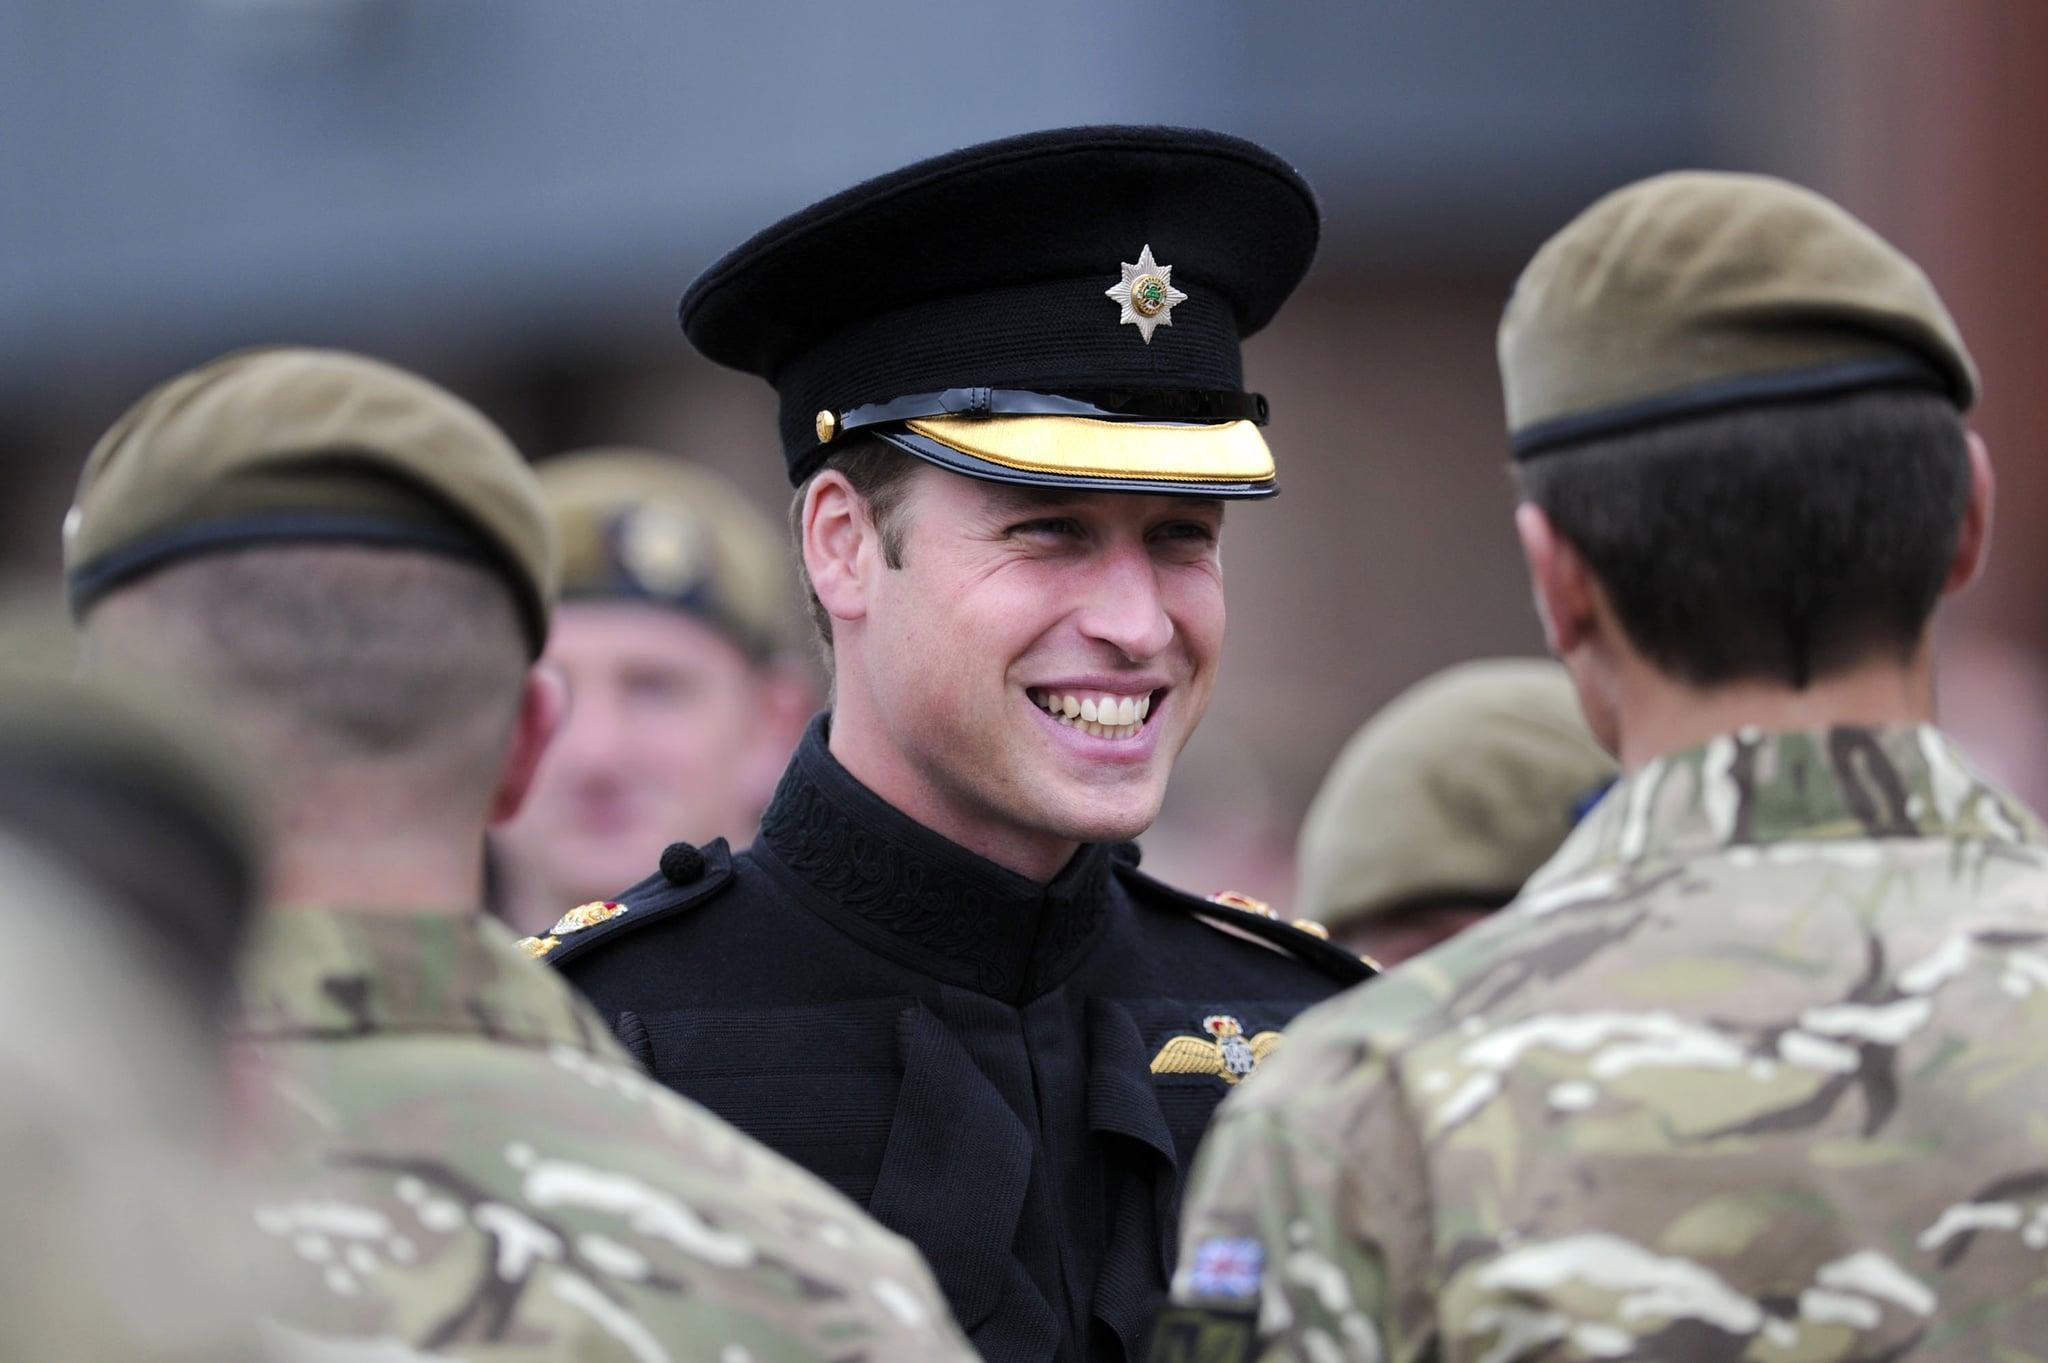 He Looks Good in a Uniform